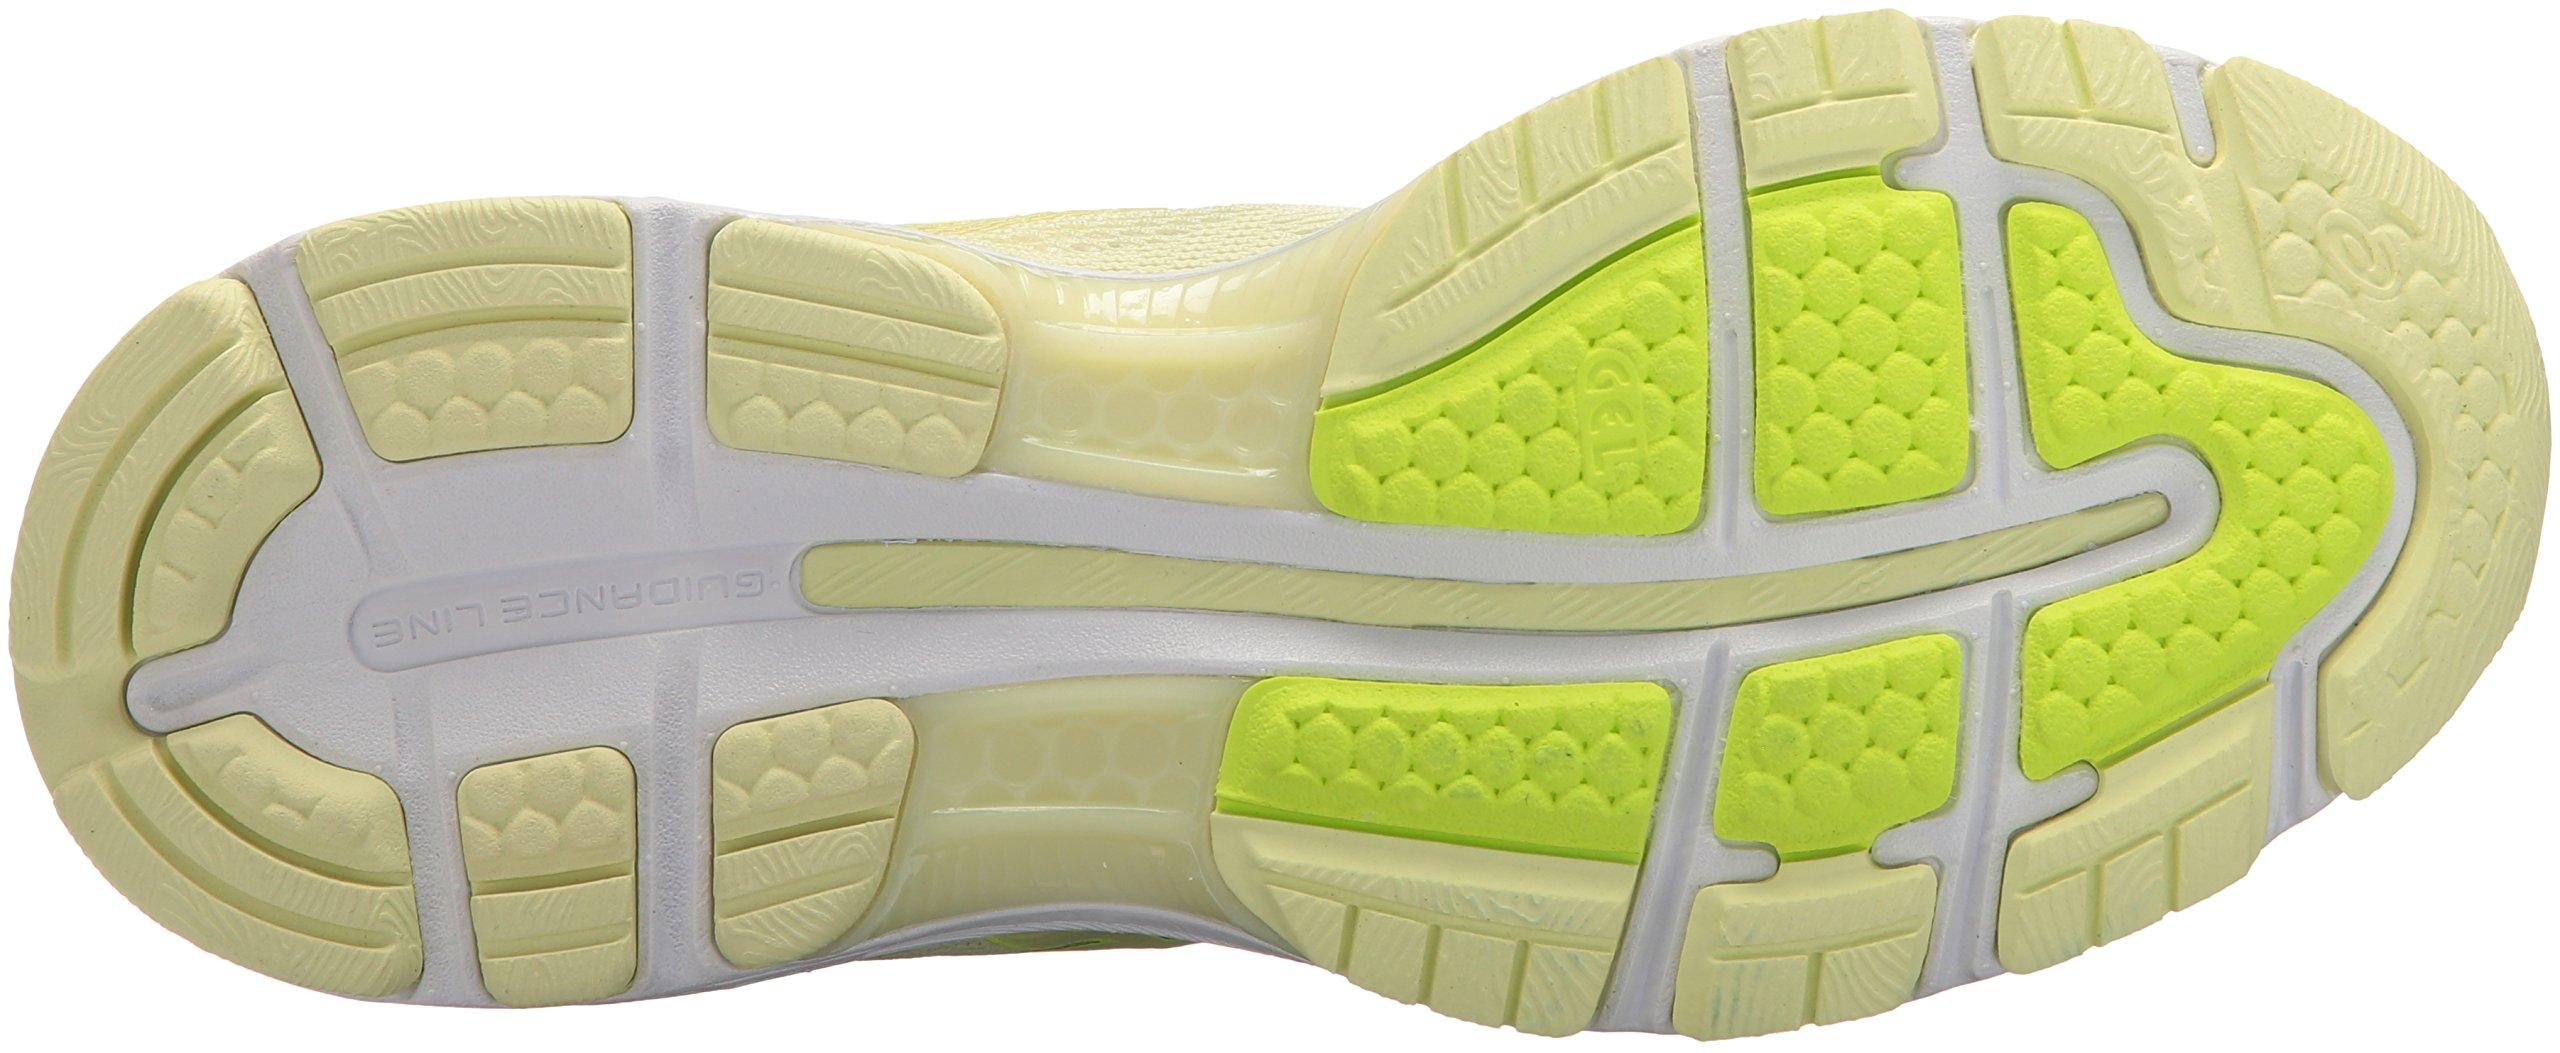 ASICS Women's Gel-Nimbus 20 Running Shoe, limelight/limelight/safety yellow, 5.5 Medium US by ASICS (Image #3)